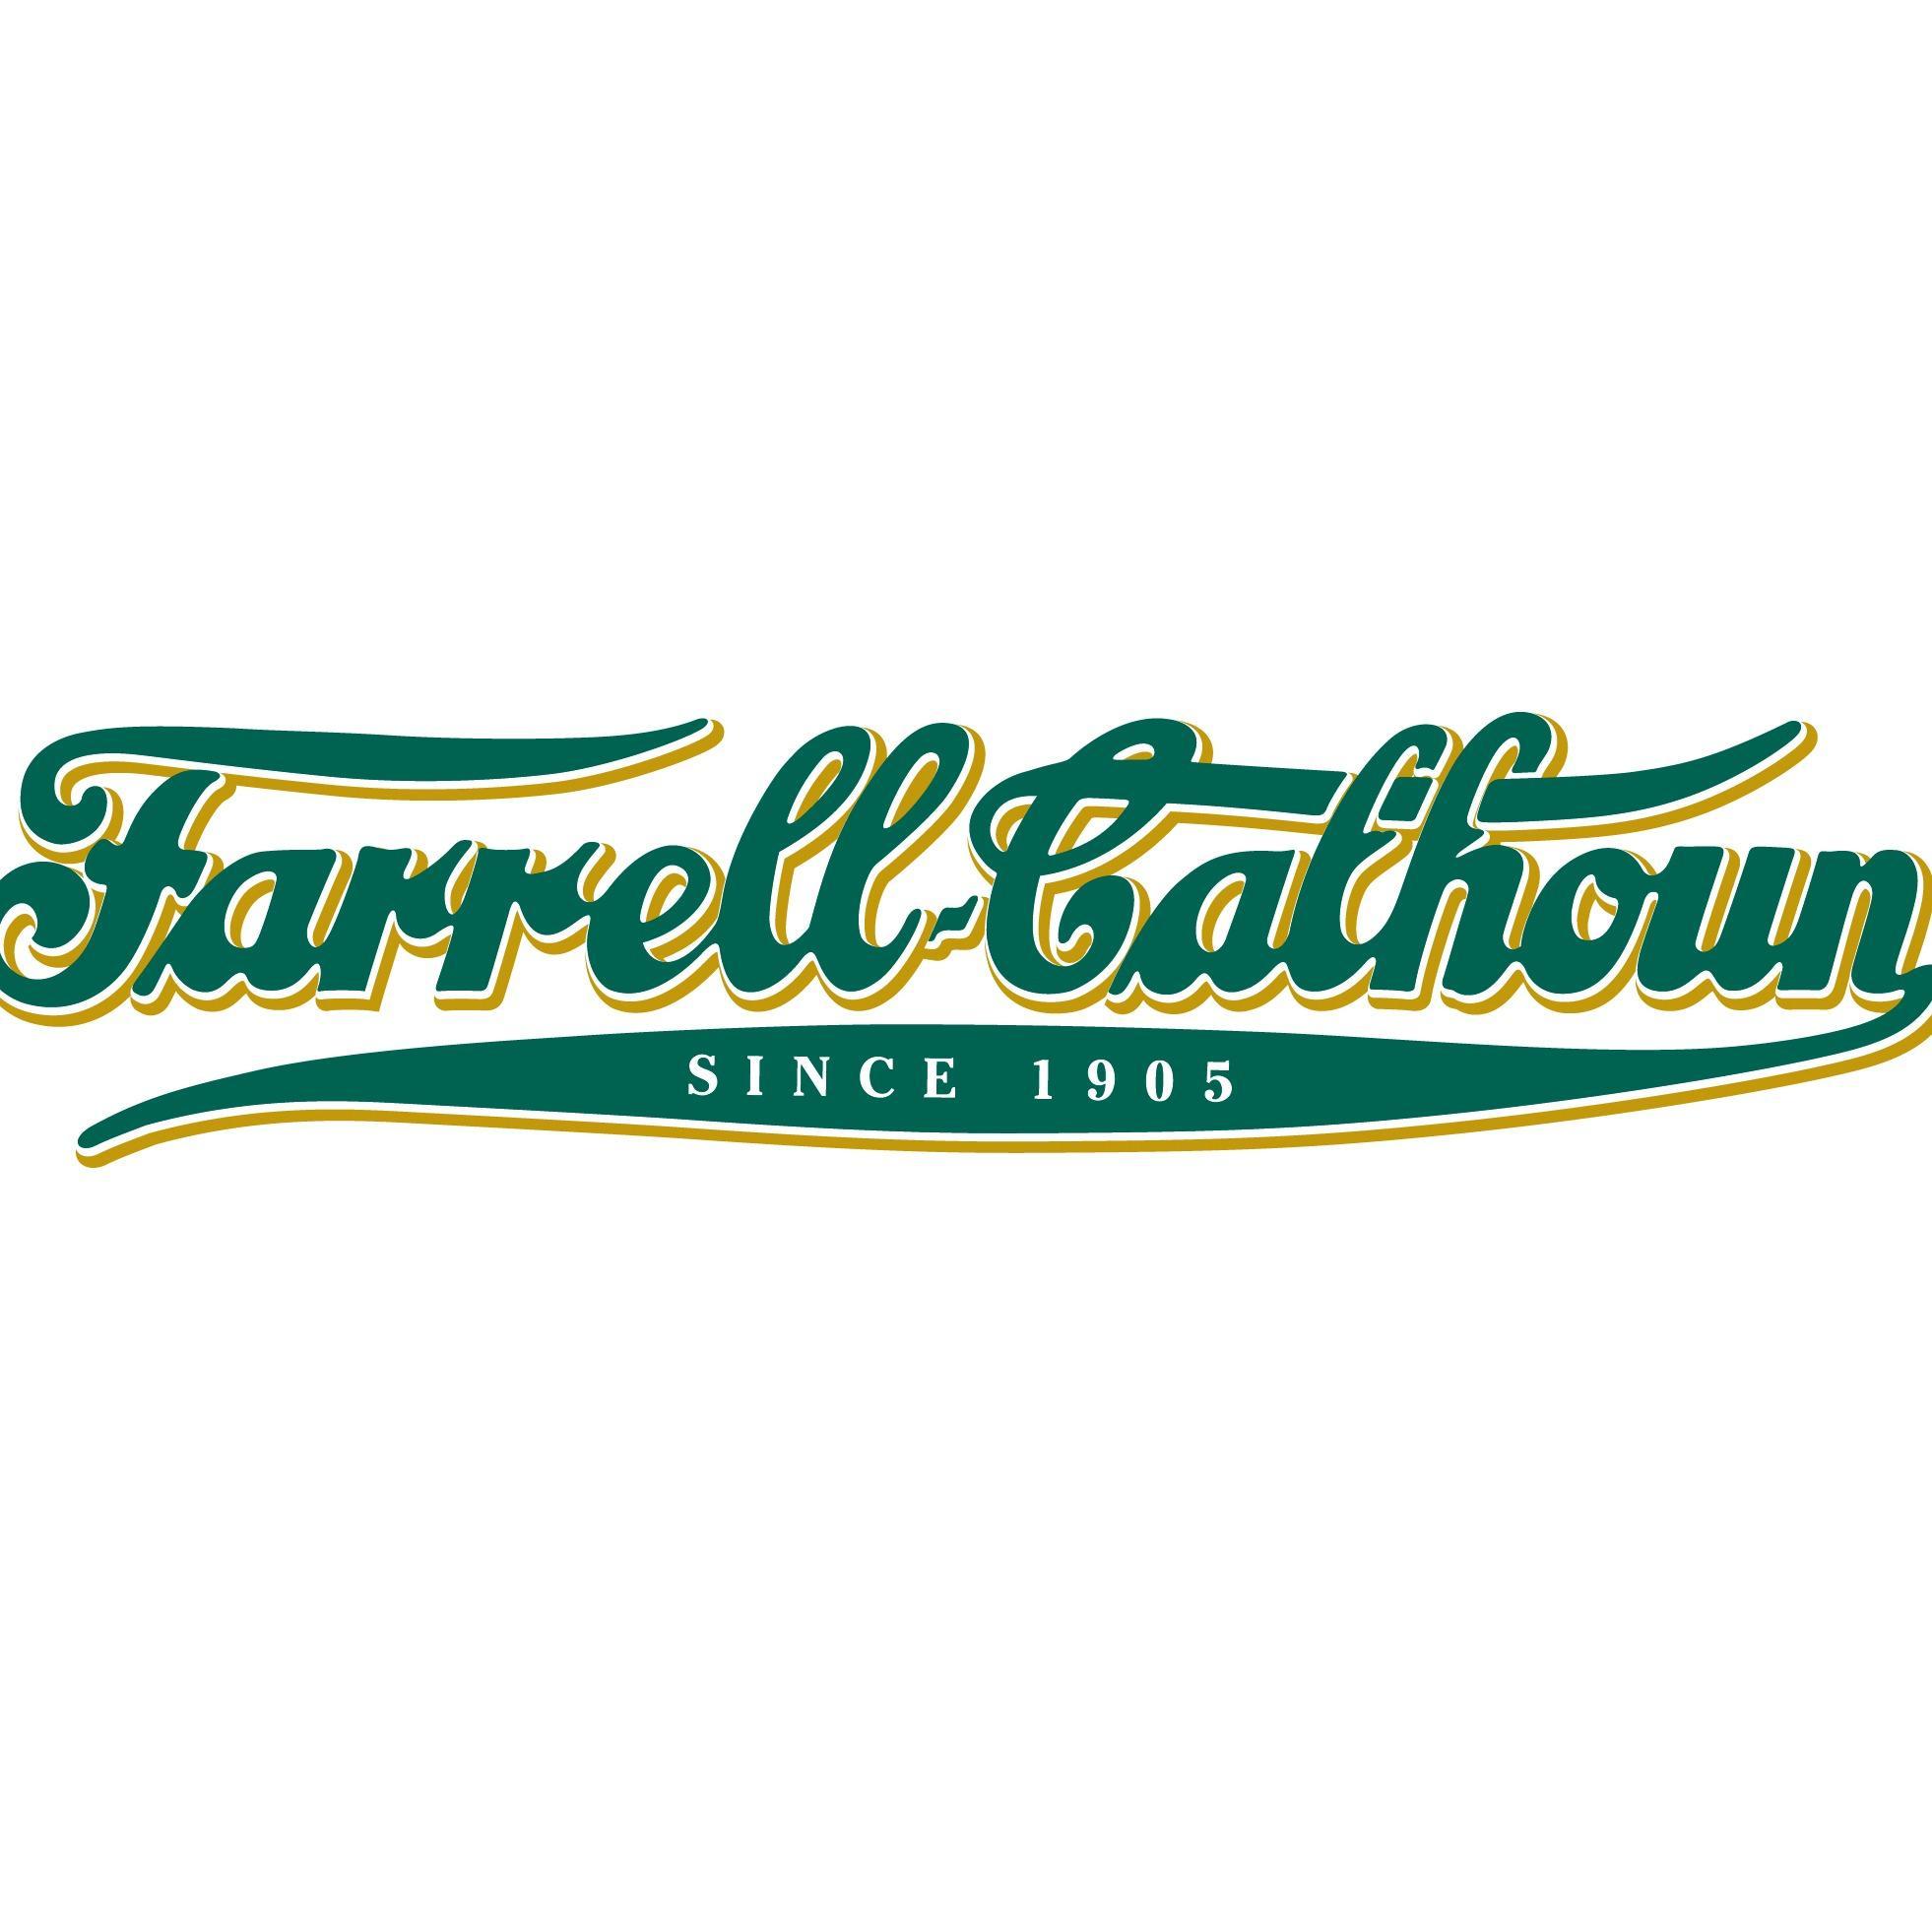 Farrell Calhoun Paint In St Peters Farrell Calhoun Paint